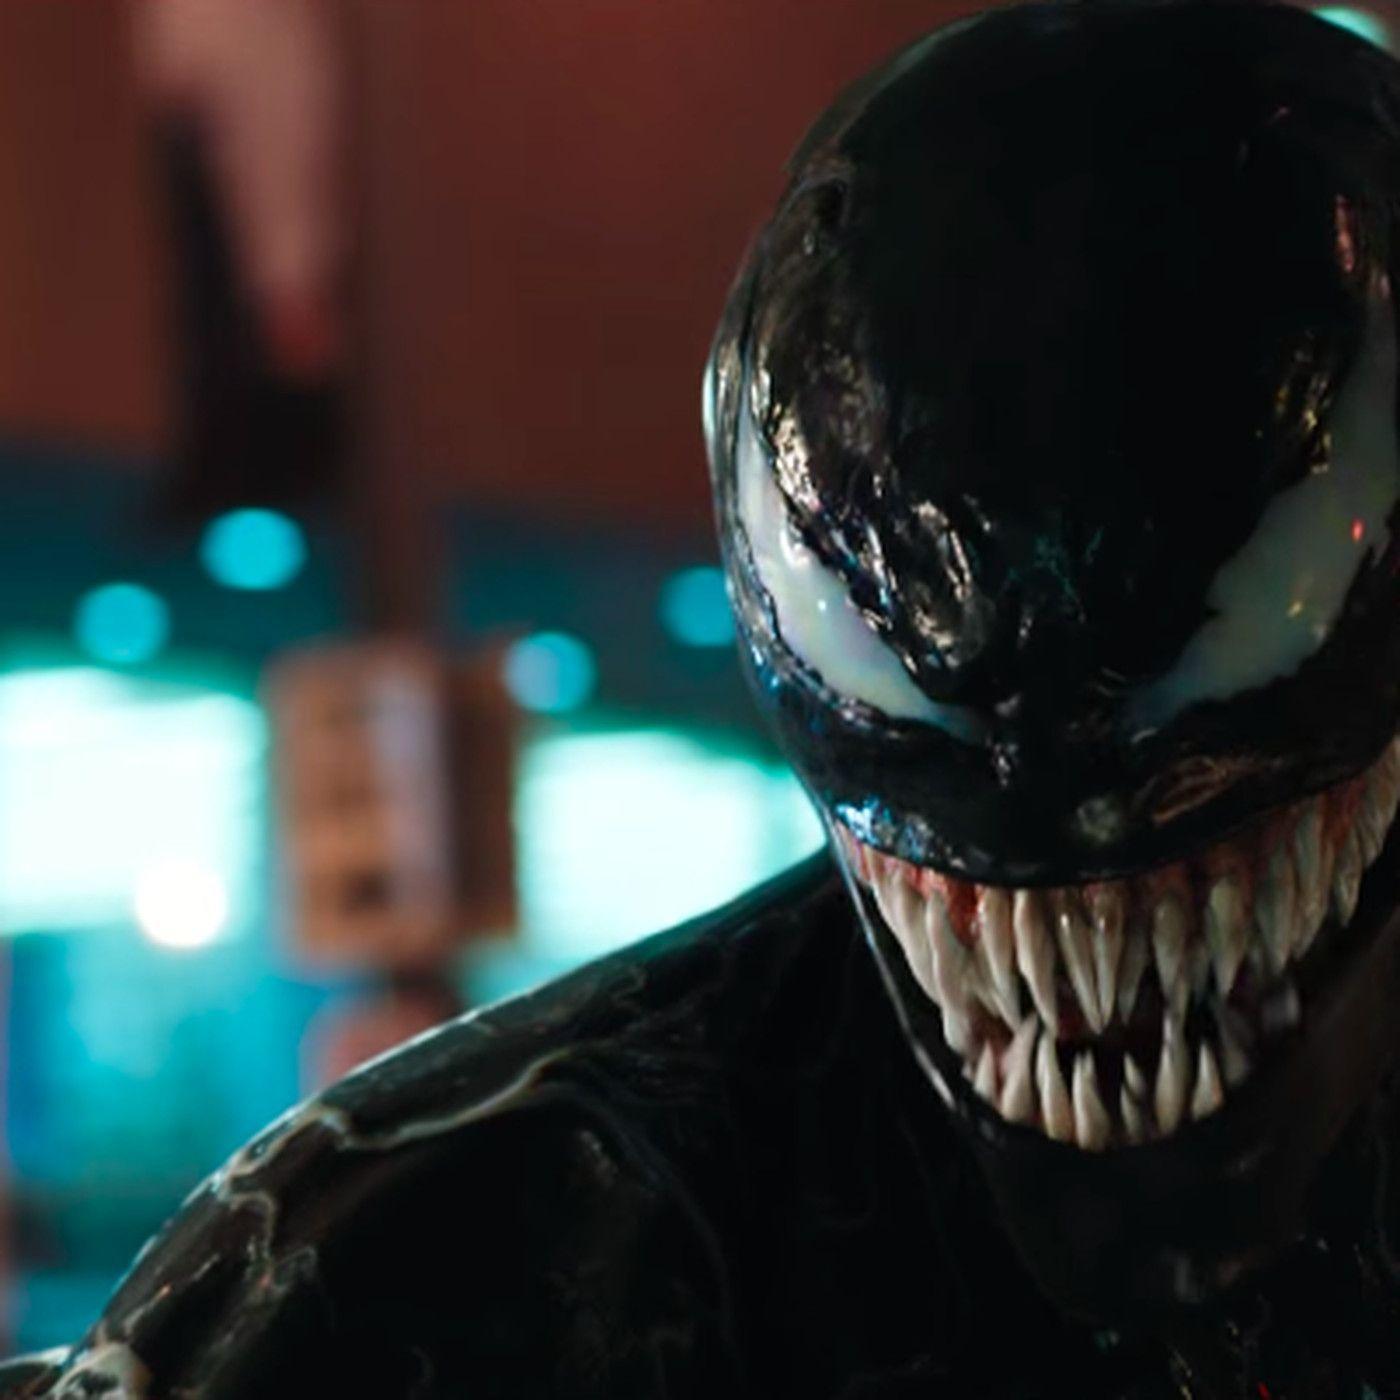 Venom Wallpapers: 58 Best Free Tom Hardy Venom Wallpapers